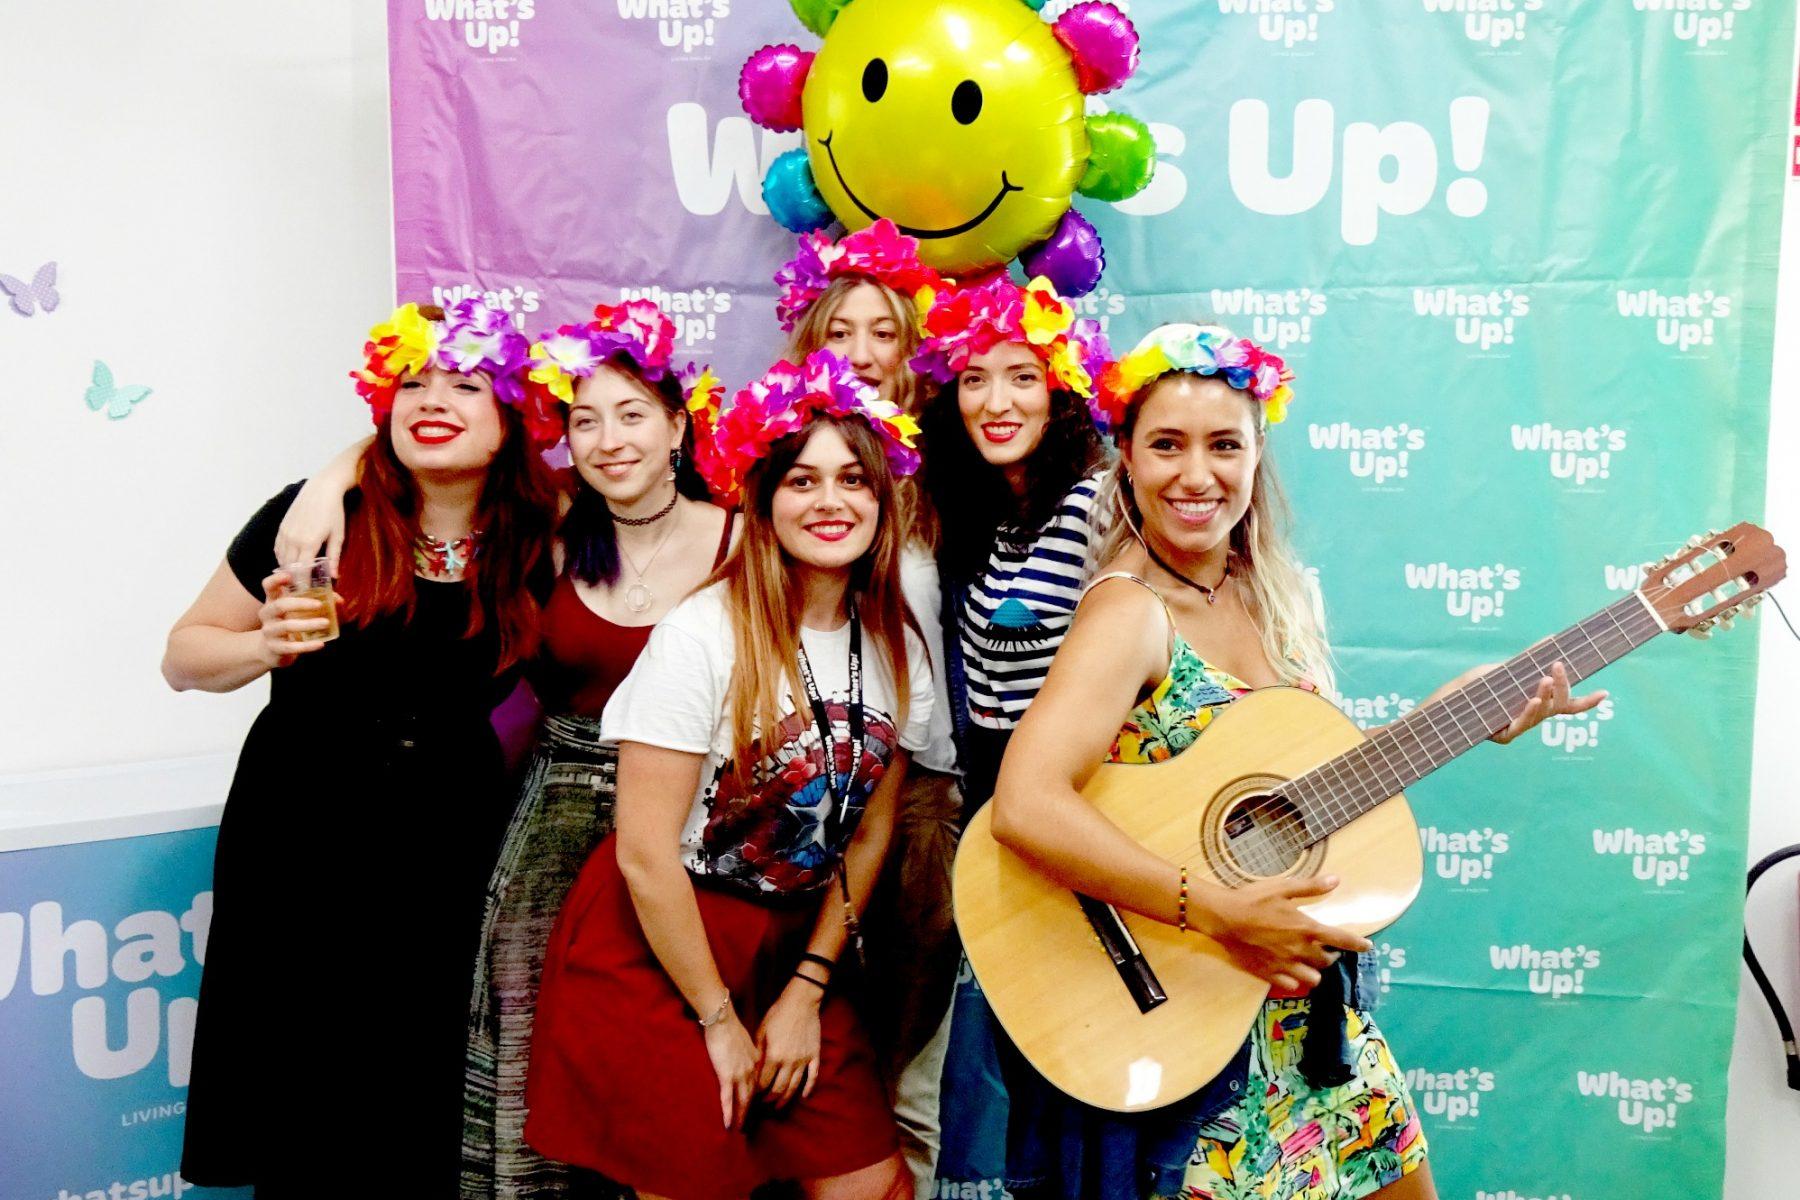 El photocall de la fiesta Summer Party de What's Up!